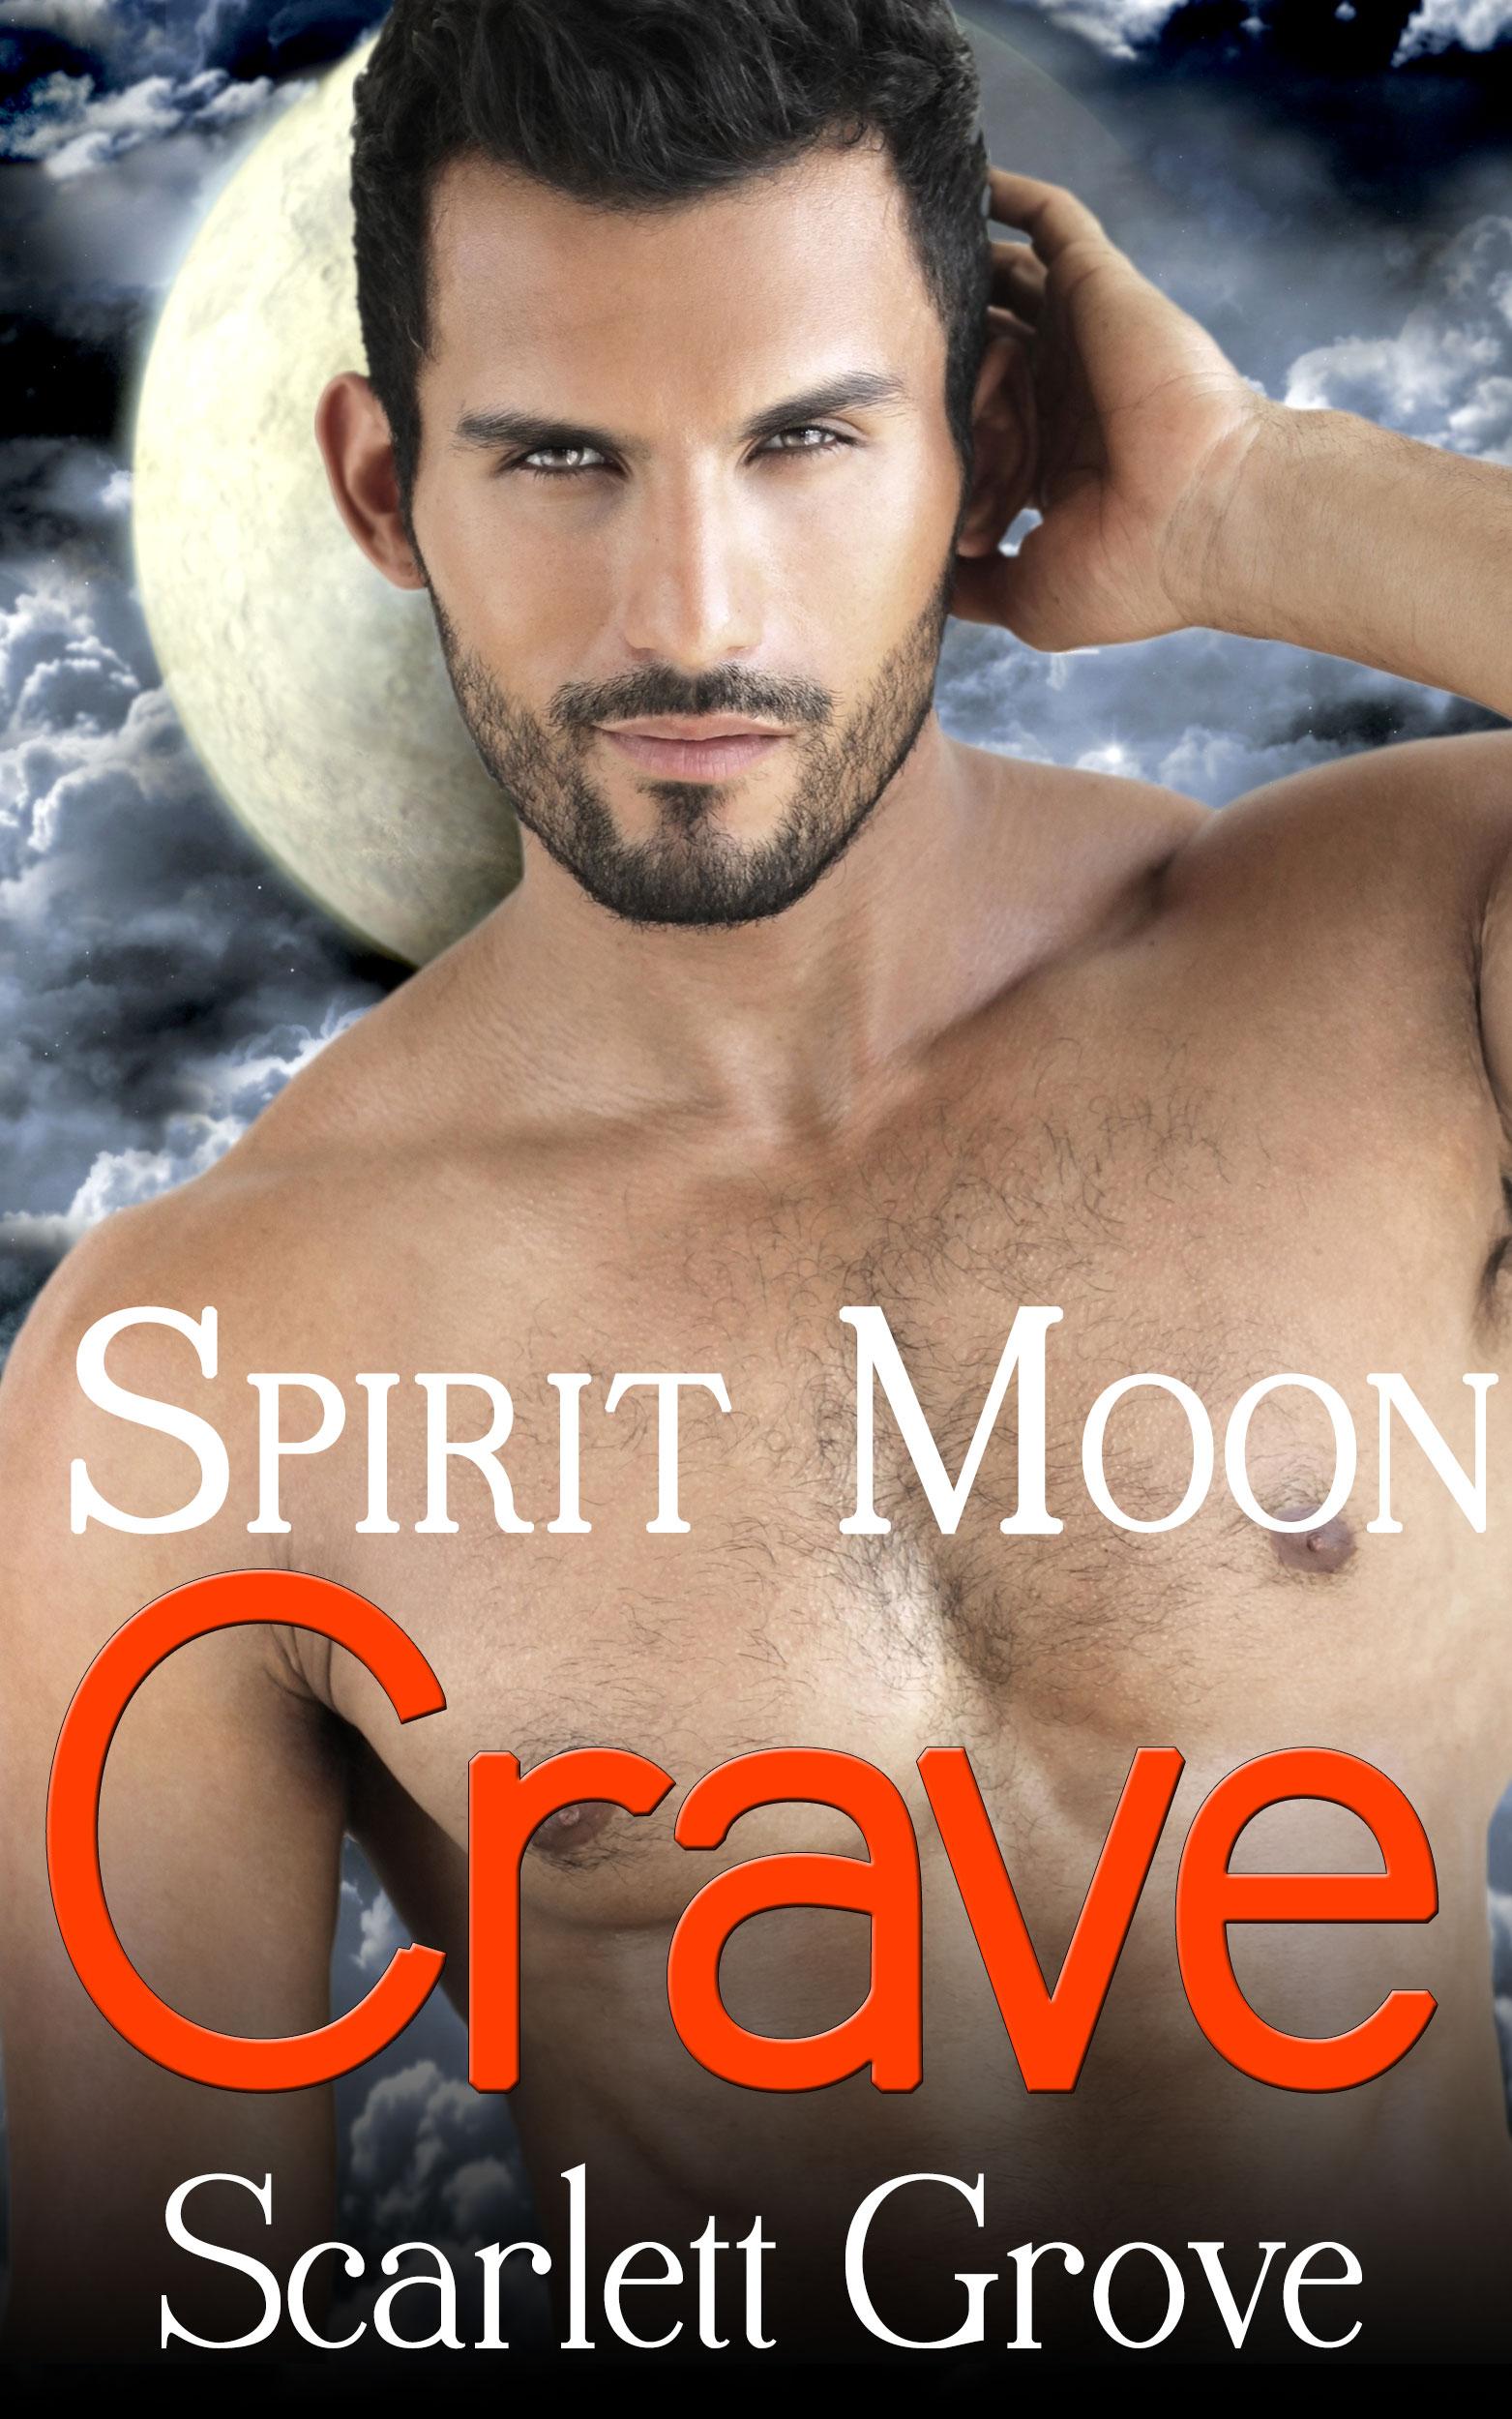 Scarlett Grove - Crave: Spirit Moon (Book Two)